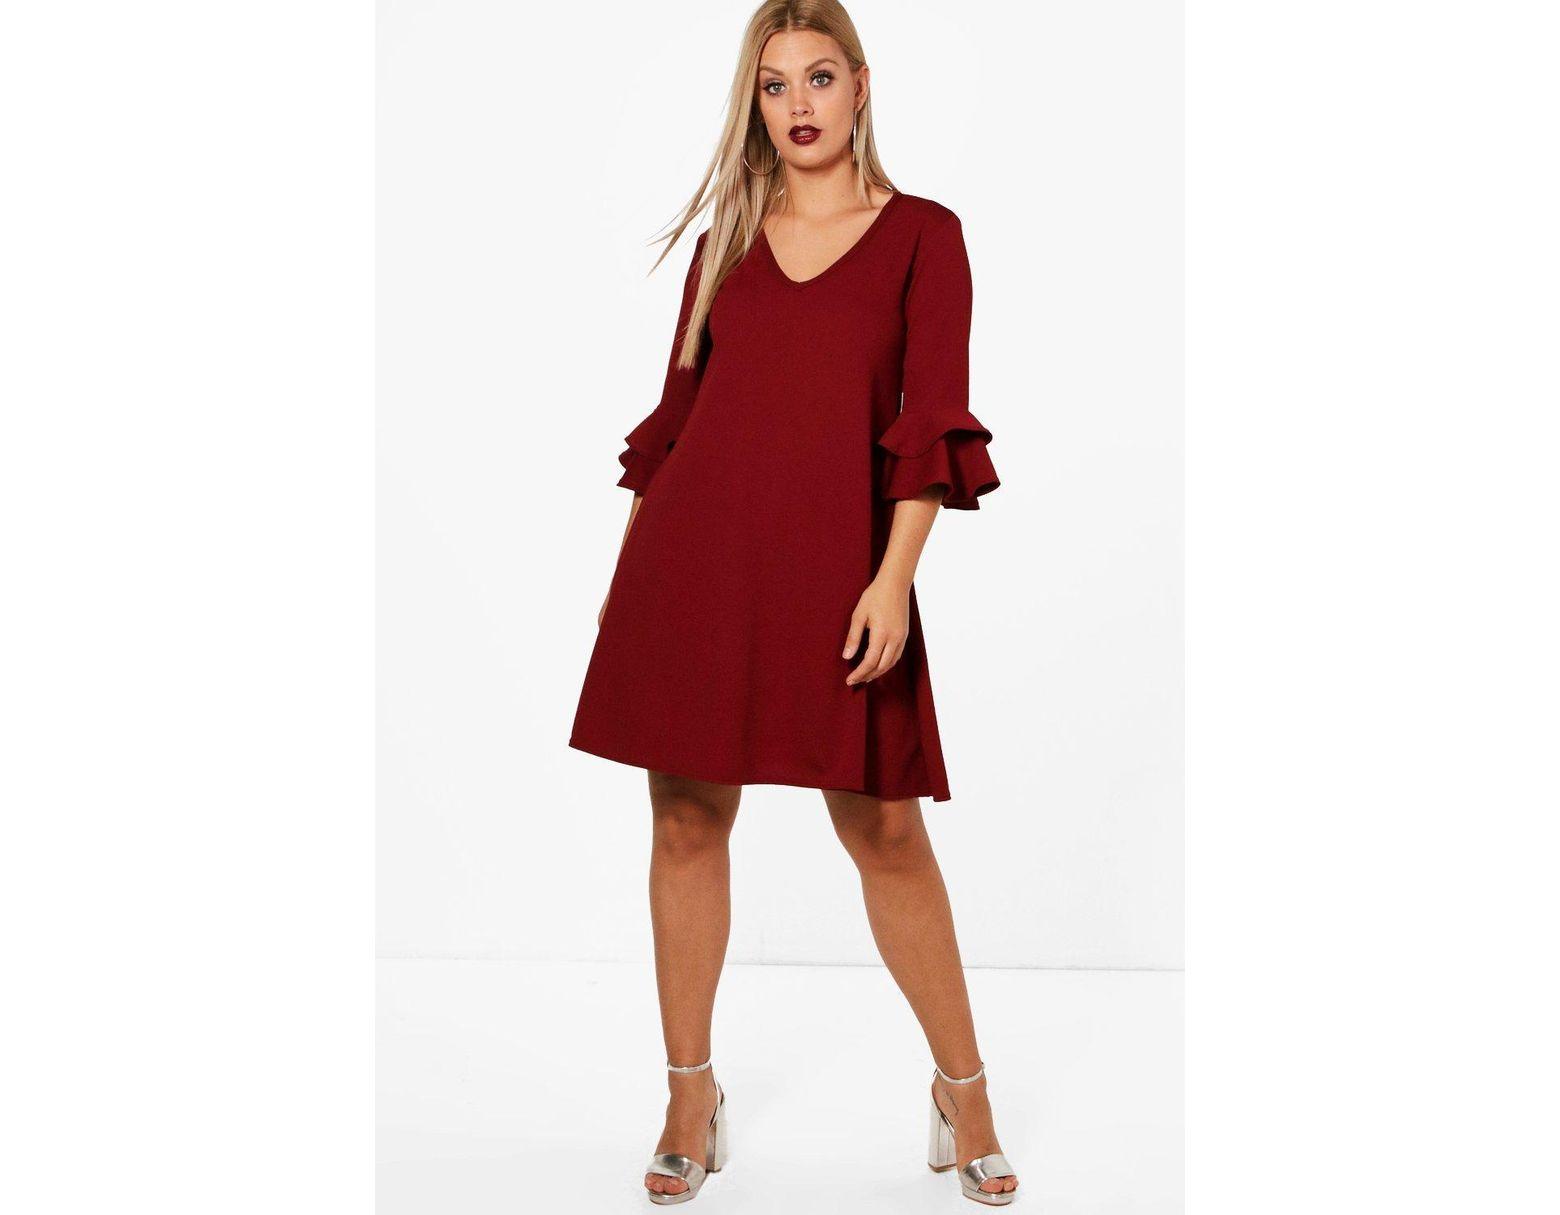 713d3bdbfd39 Boohoo Plus Crepe Ruffle Sleeve Shift Dress in Red - Lyst